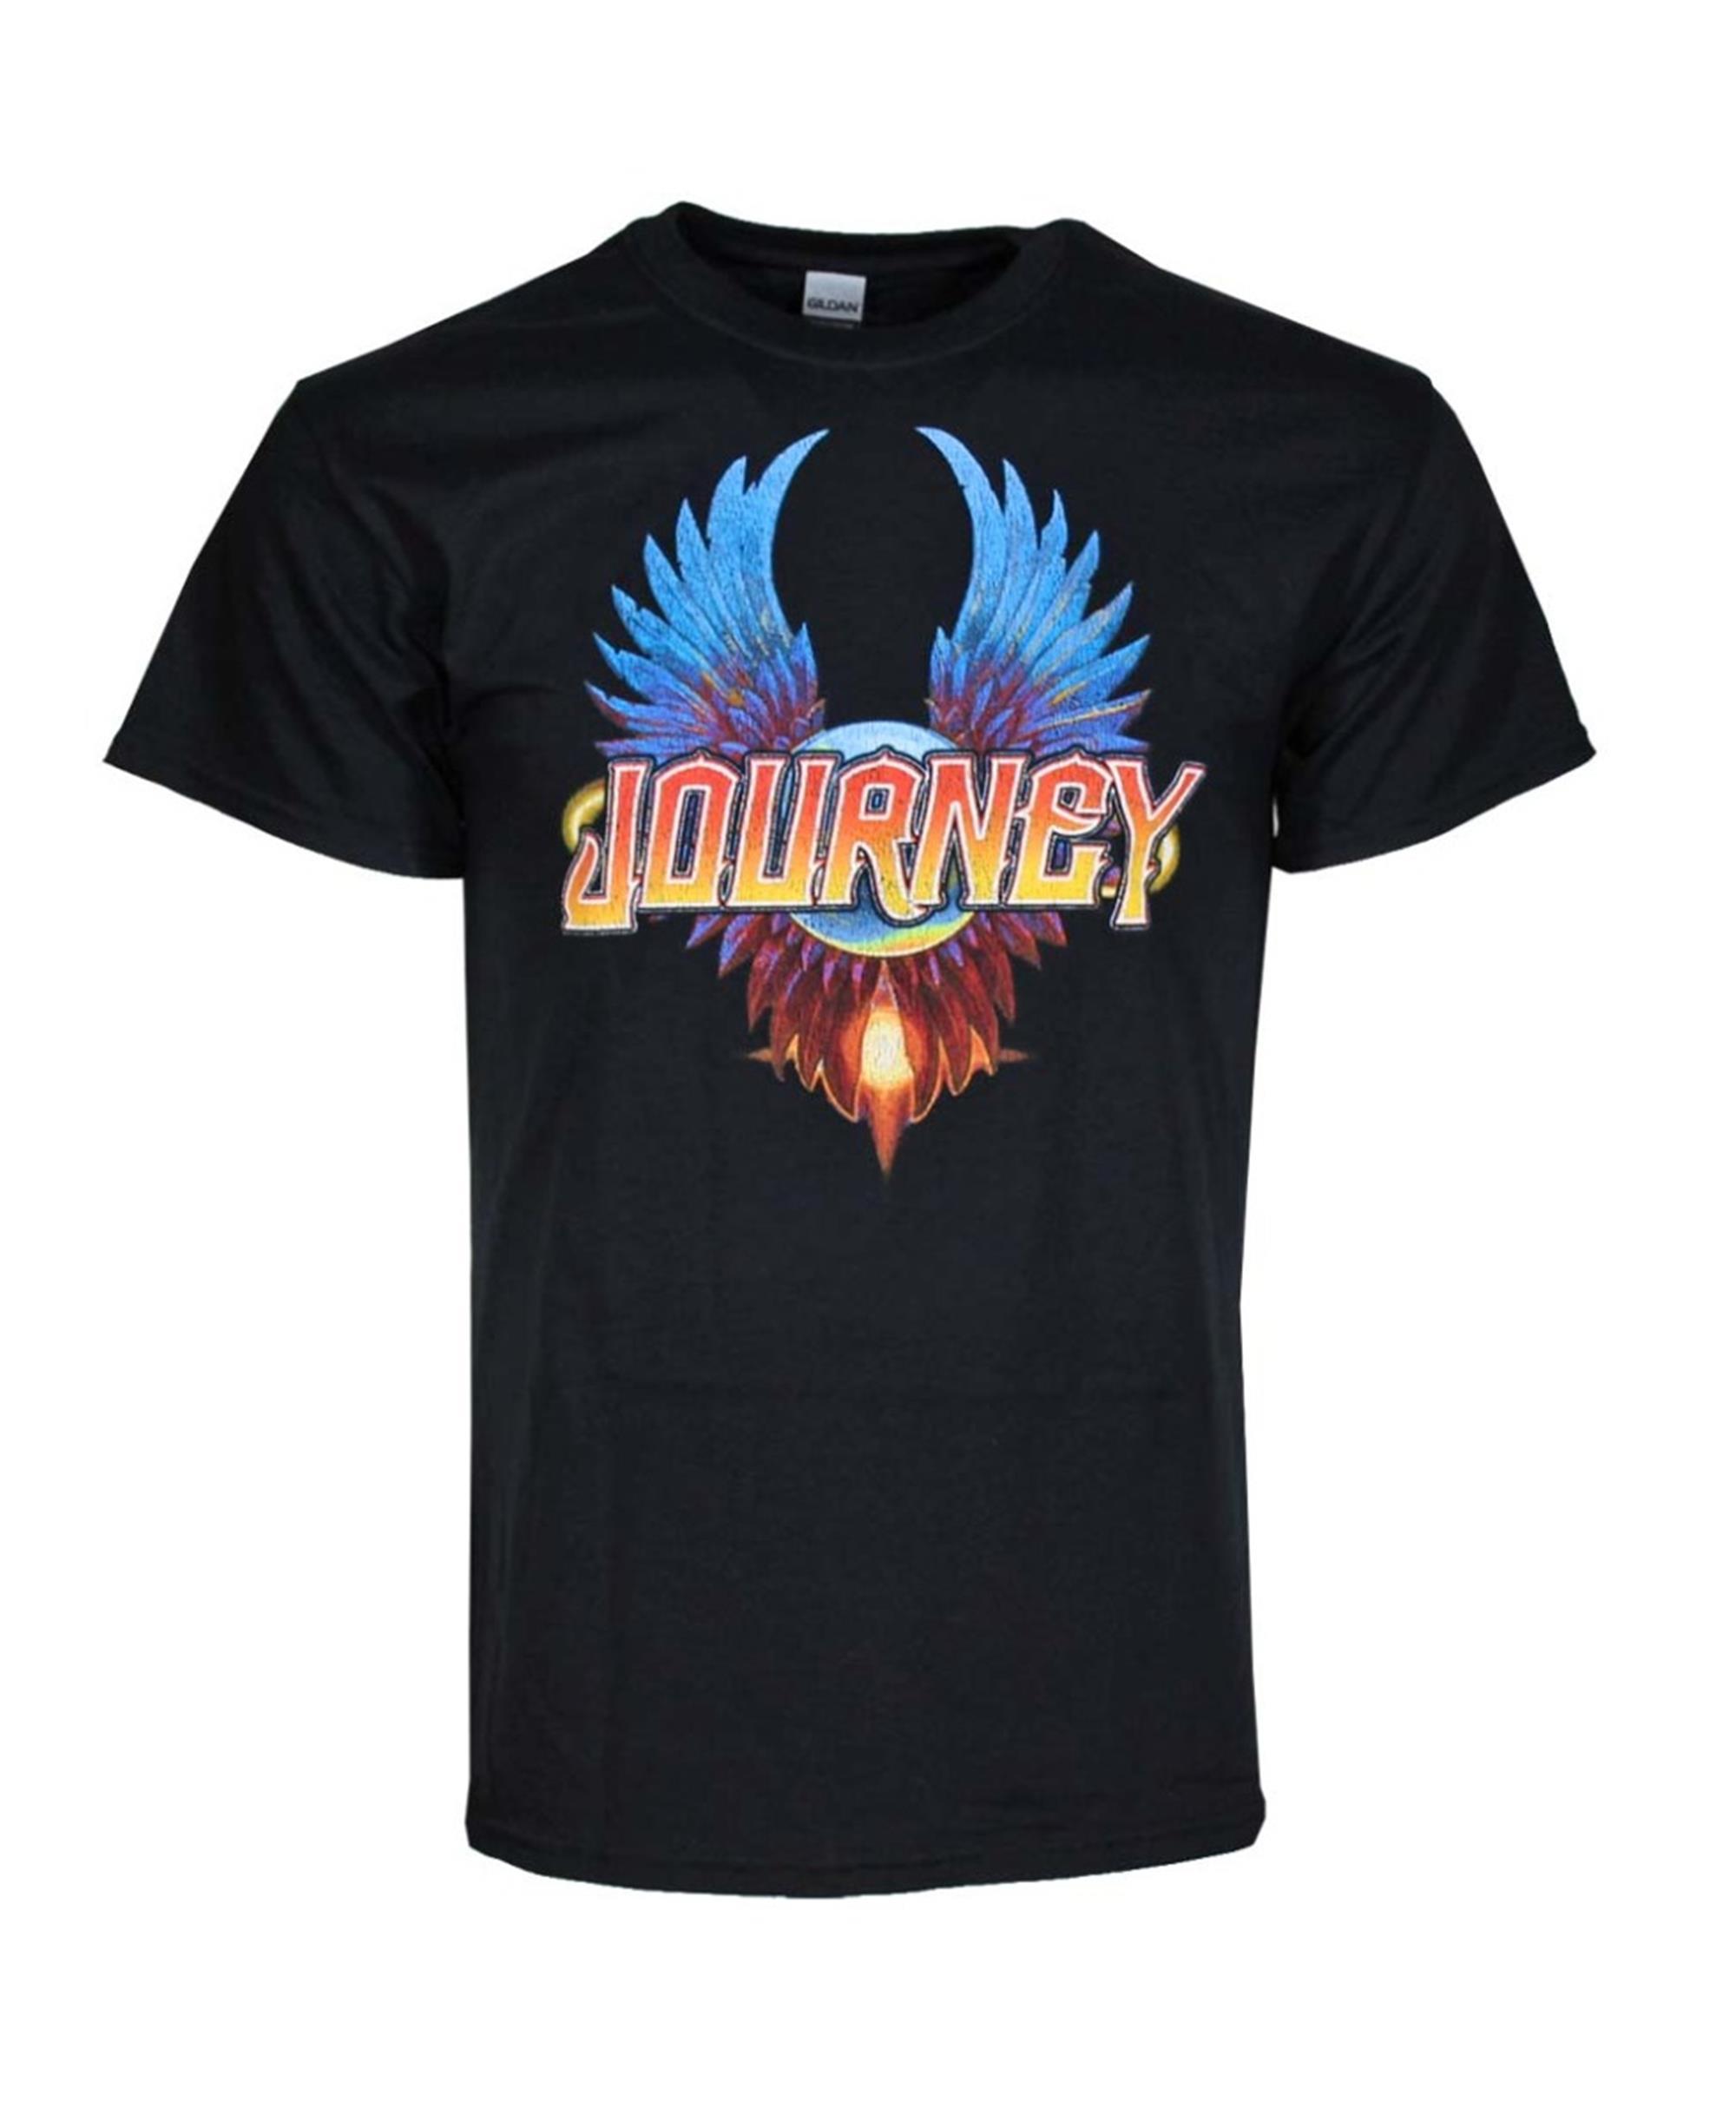 Journey Black Classic Wings T-Shirt